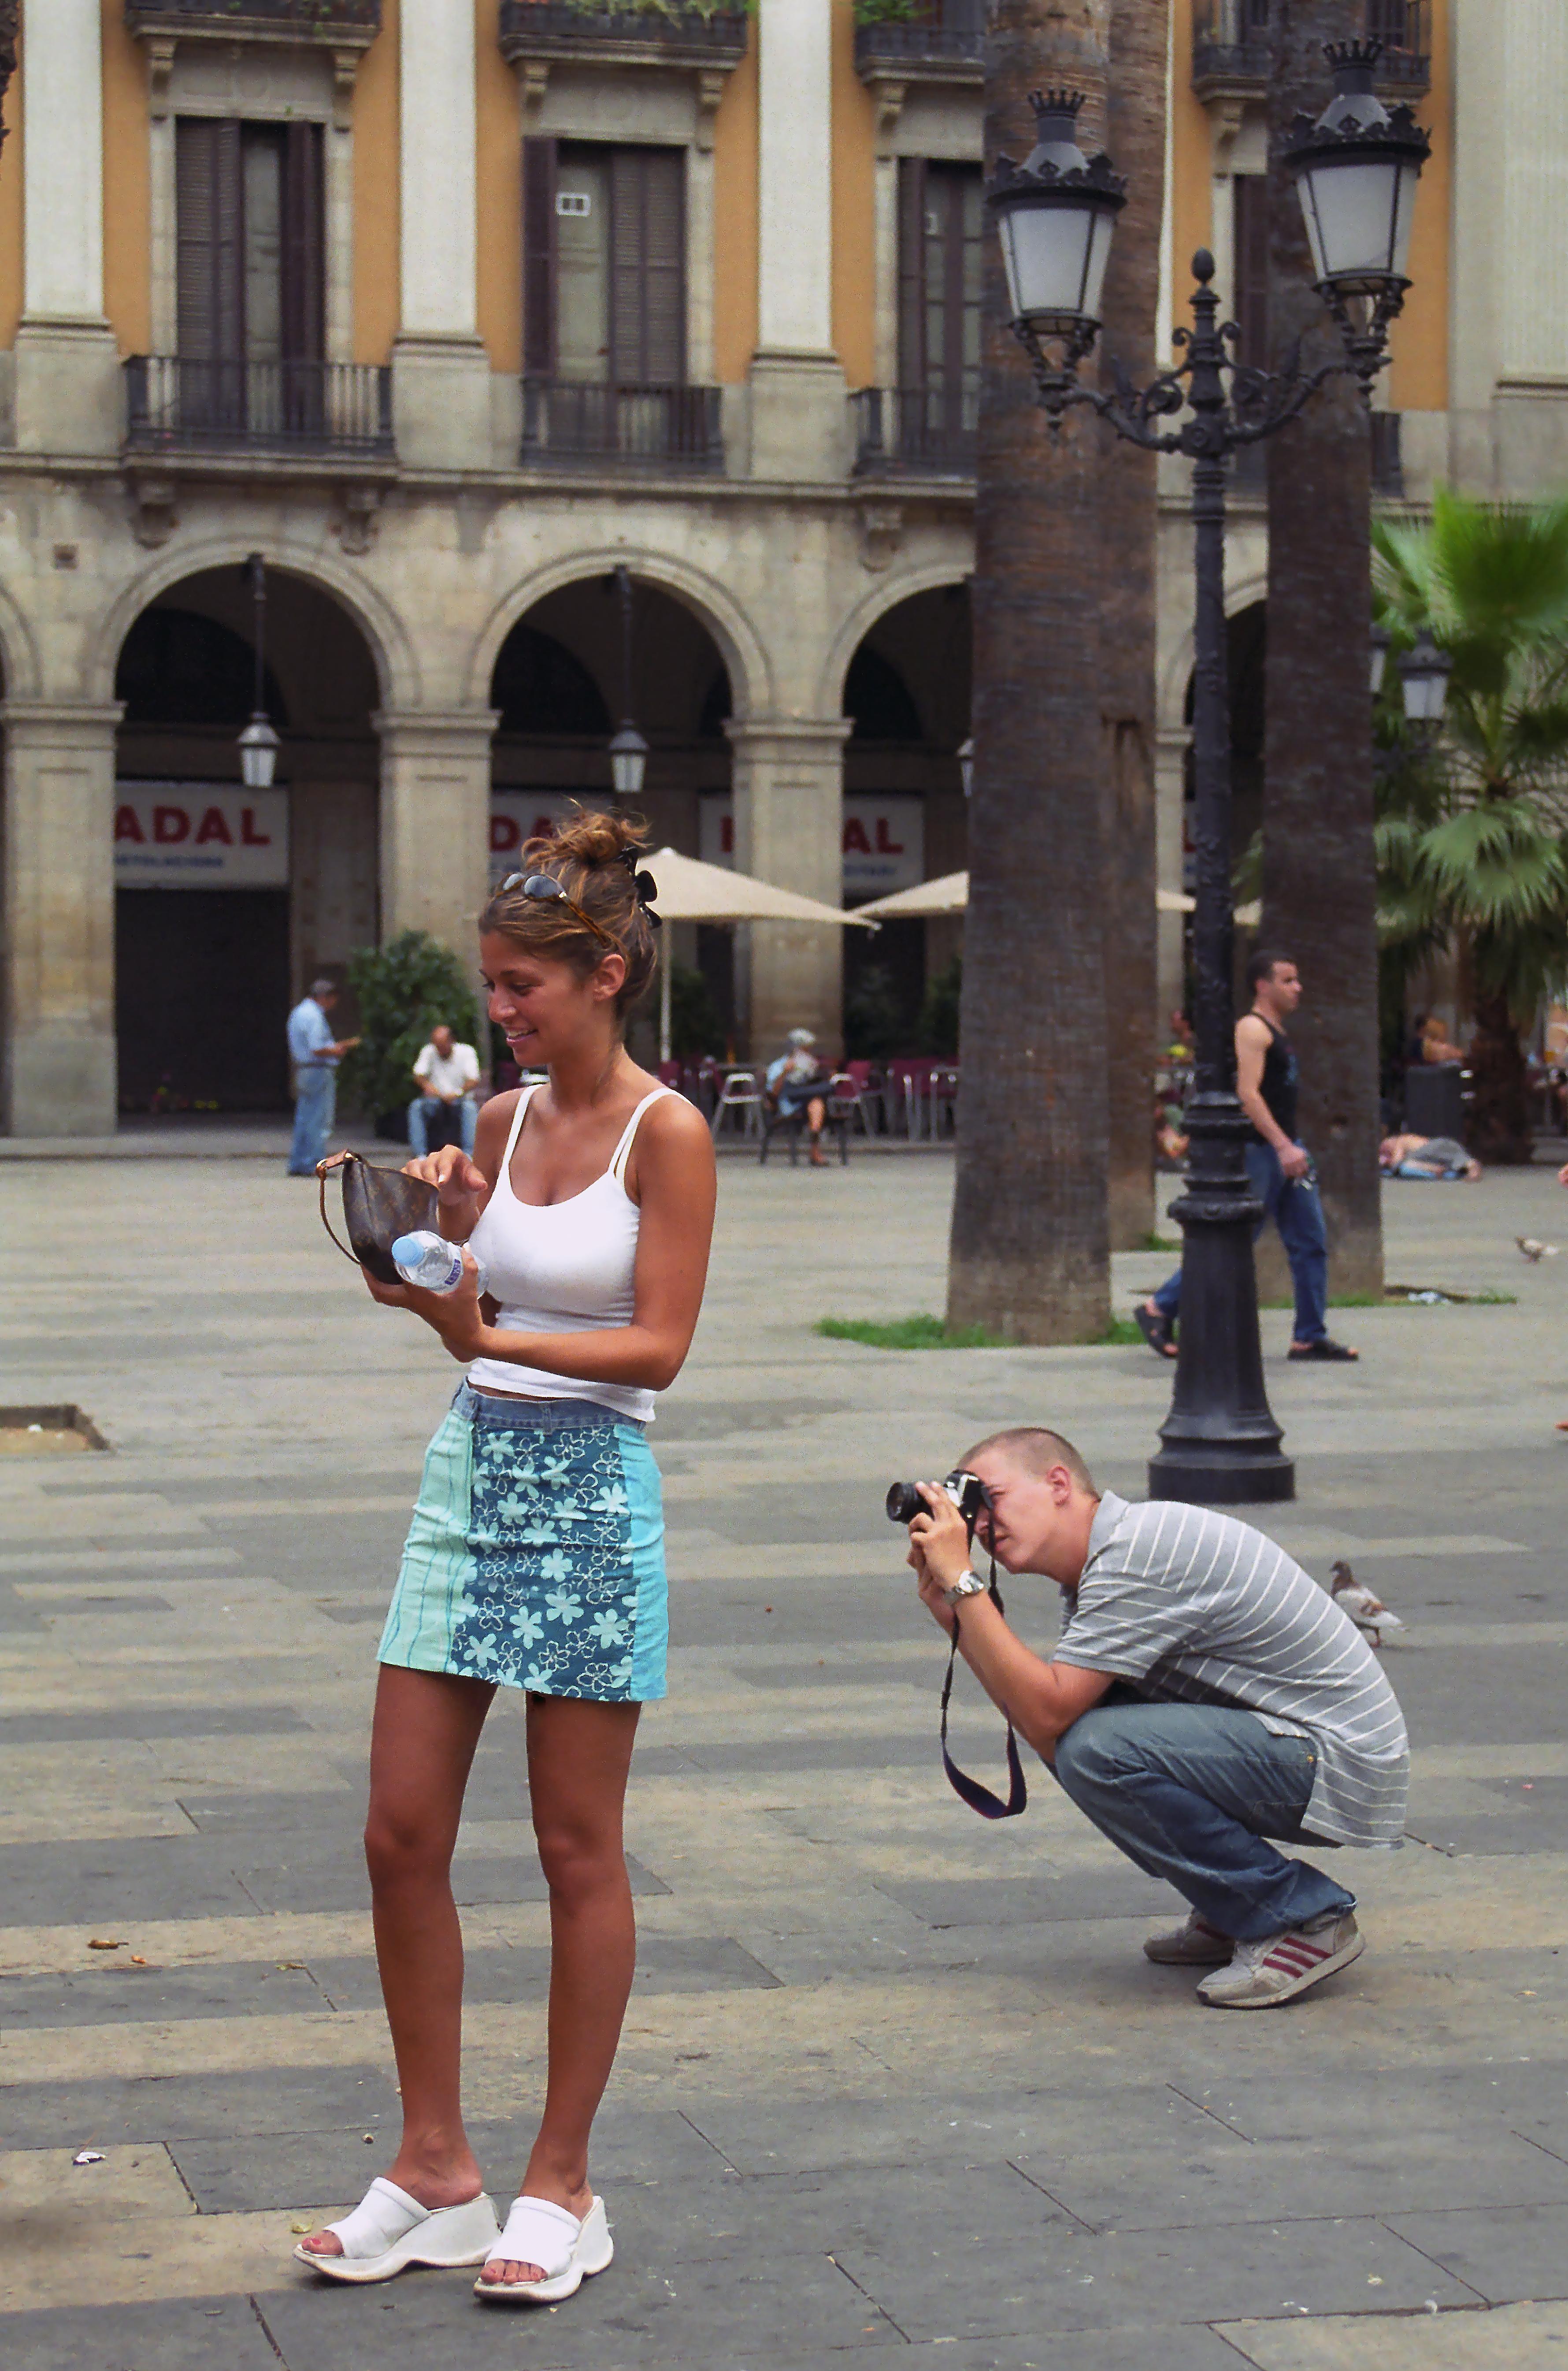 barcelona_plaça_reial_4_cs16.jpg